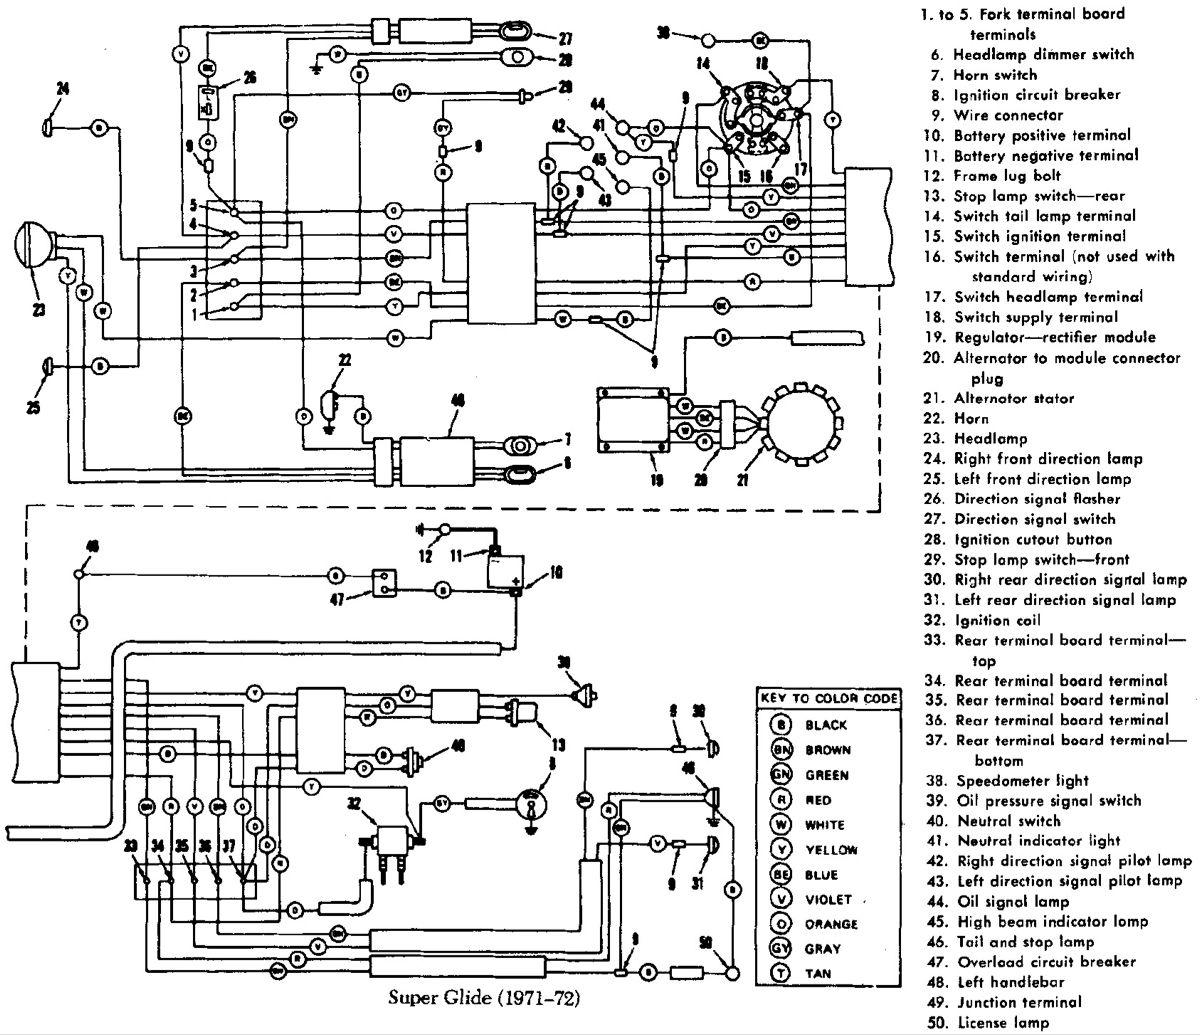 Pin By Big Ds On Darrel Yep In 2021 Wiring Diagram Softail Motorcycle Wiring